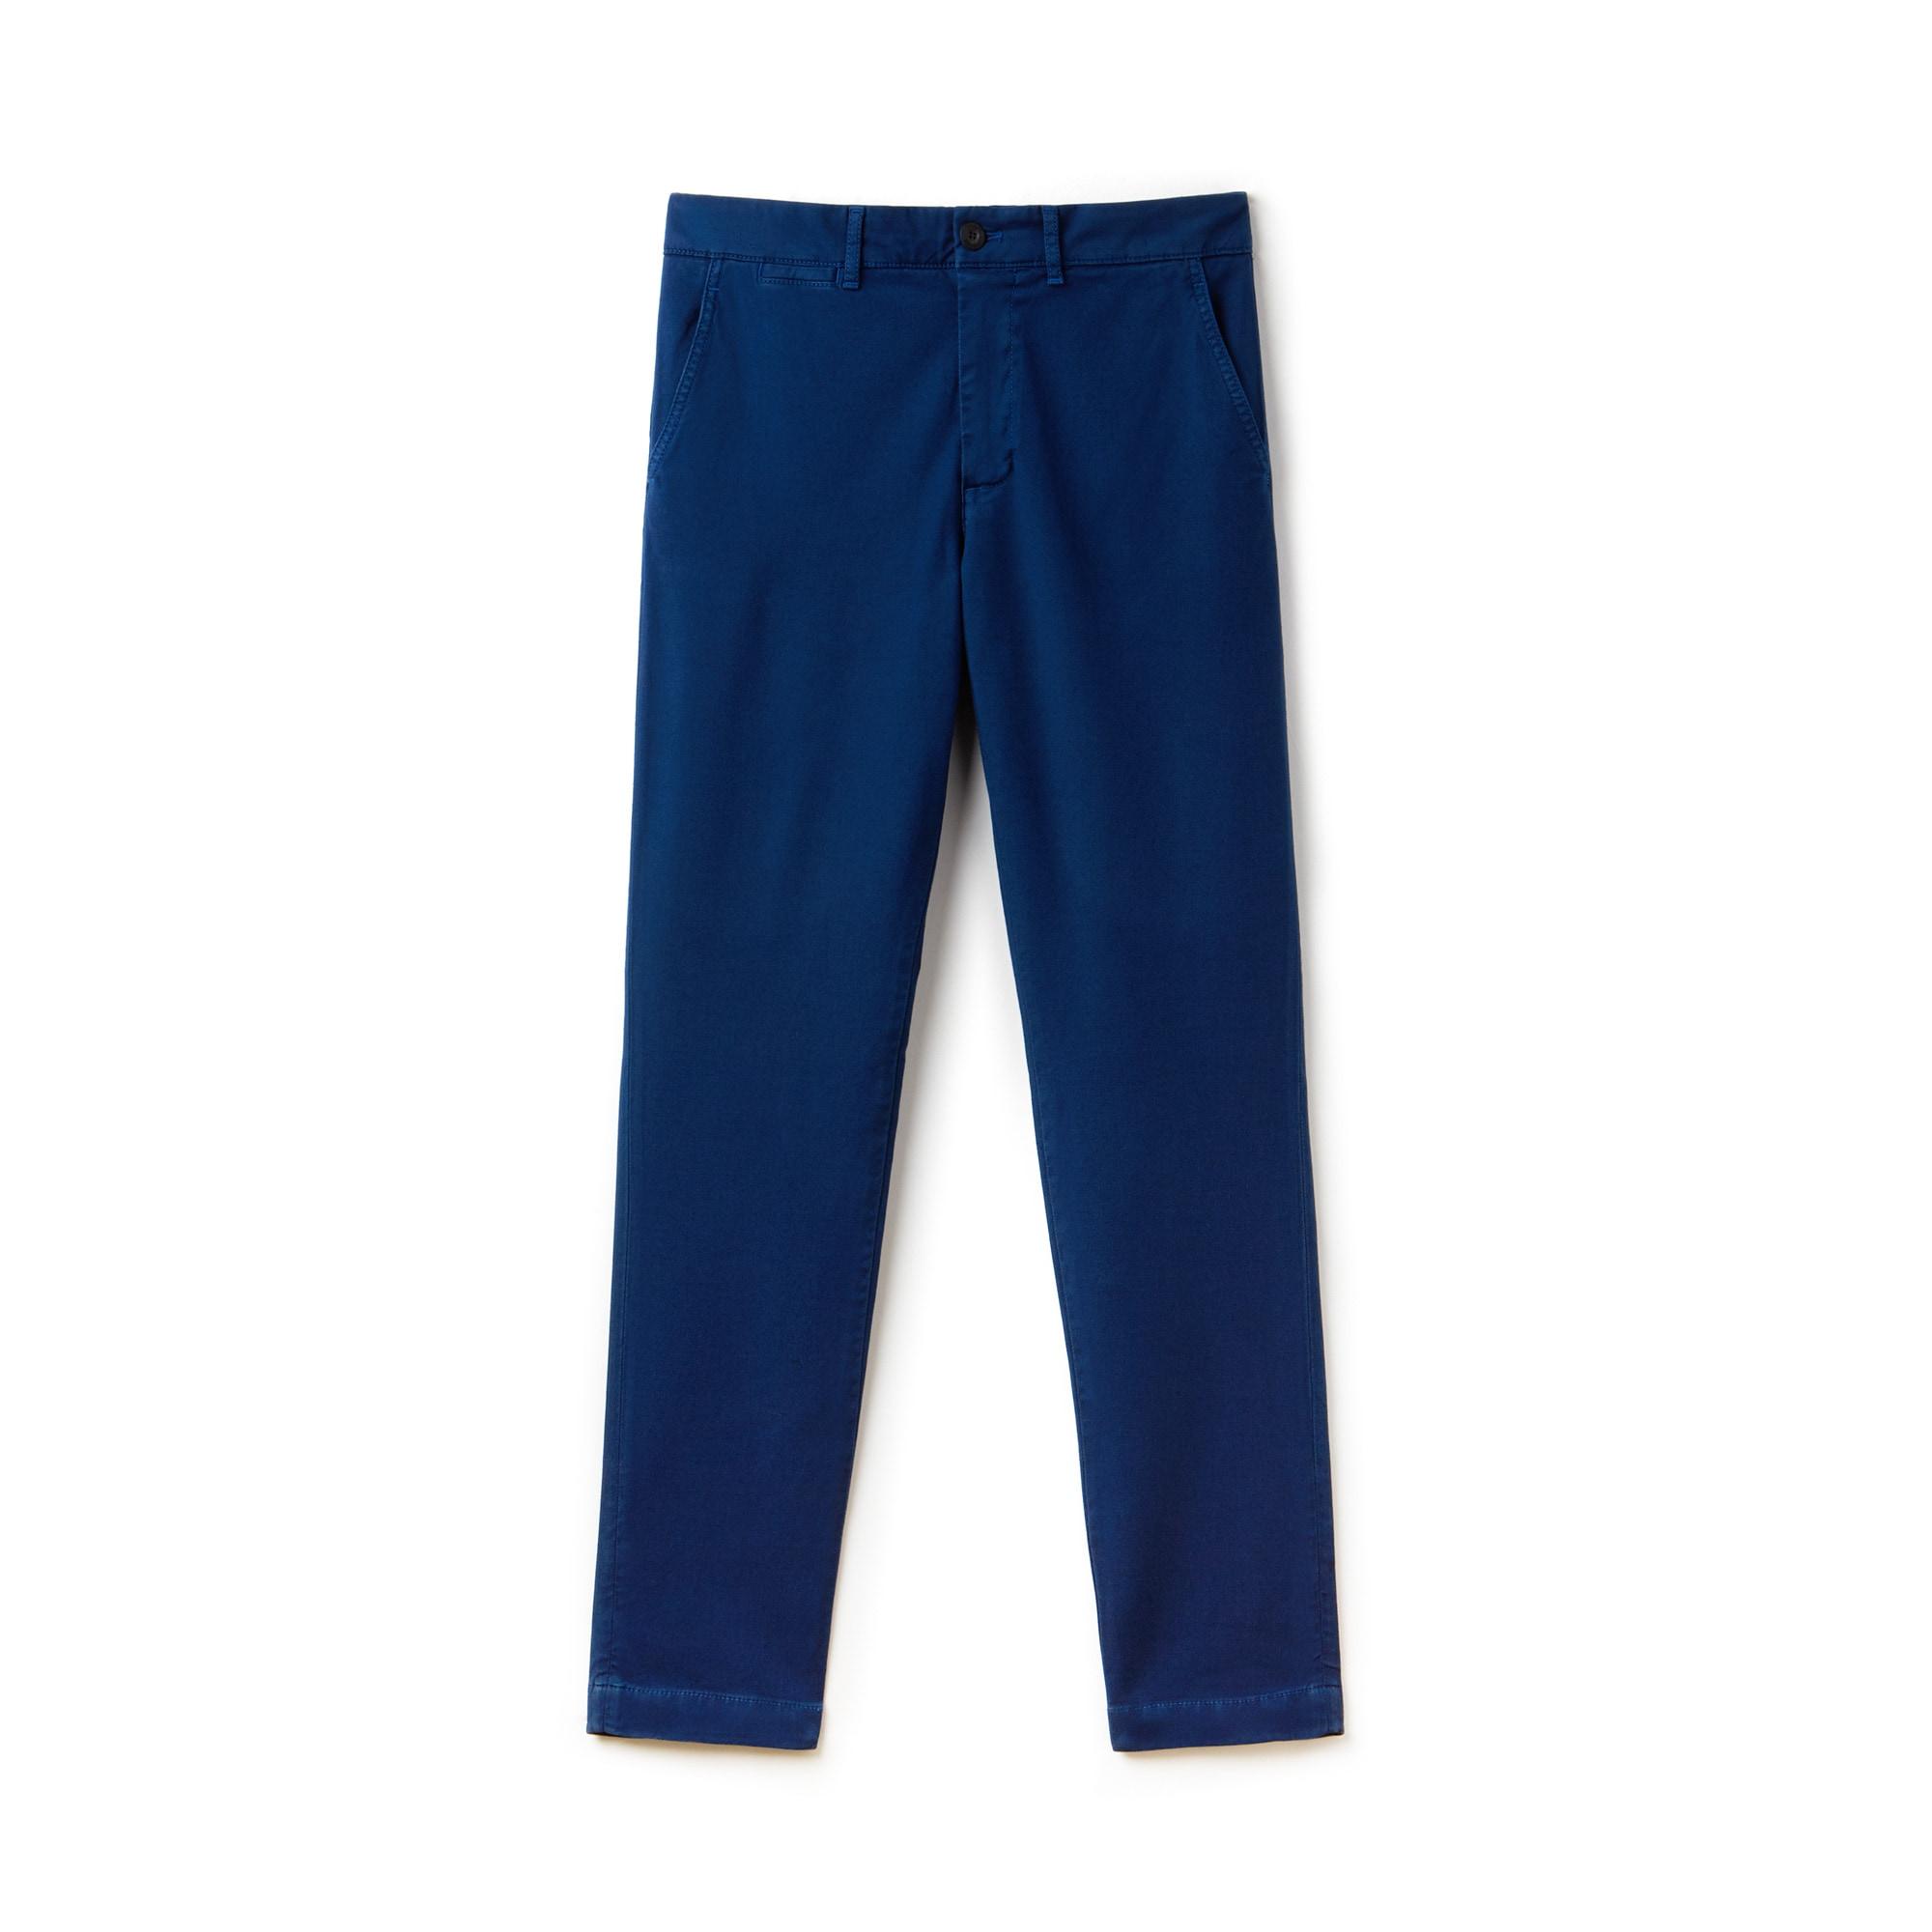 Pantalon chino slim fit en coton stretch texturé